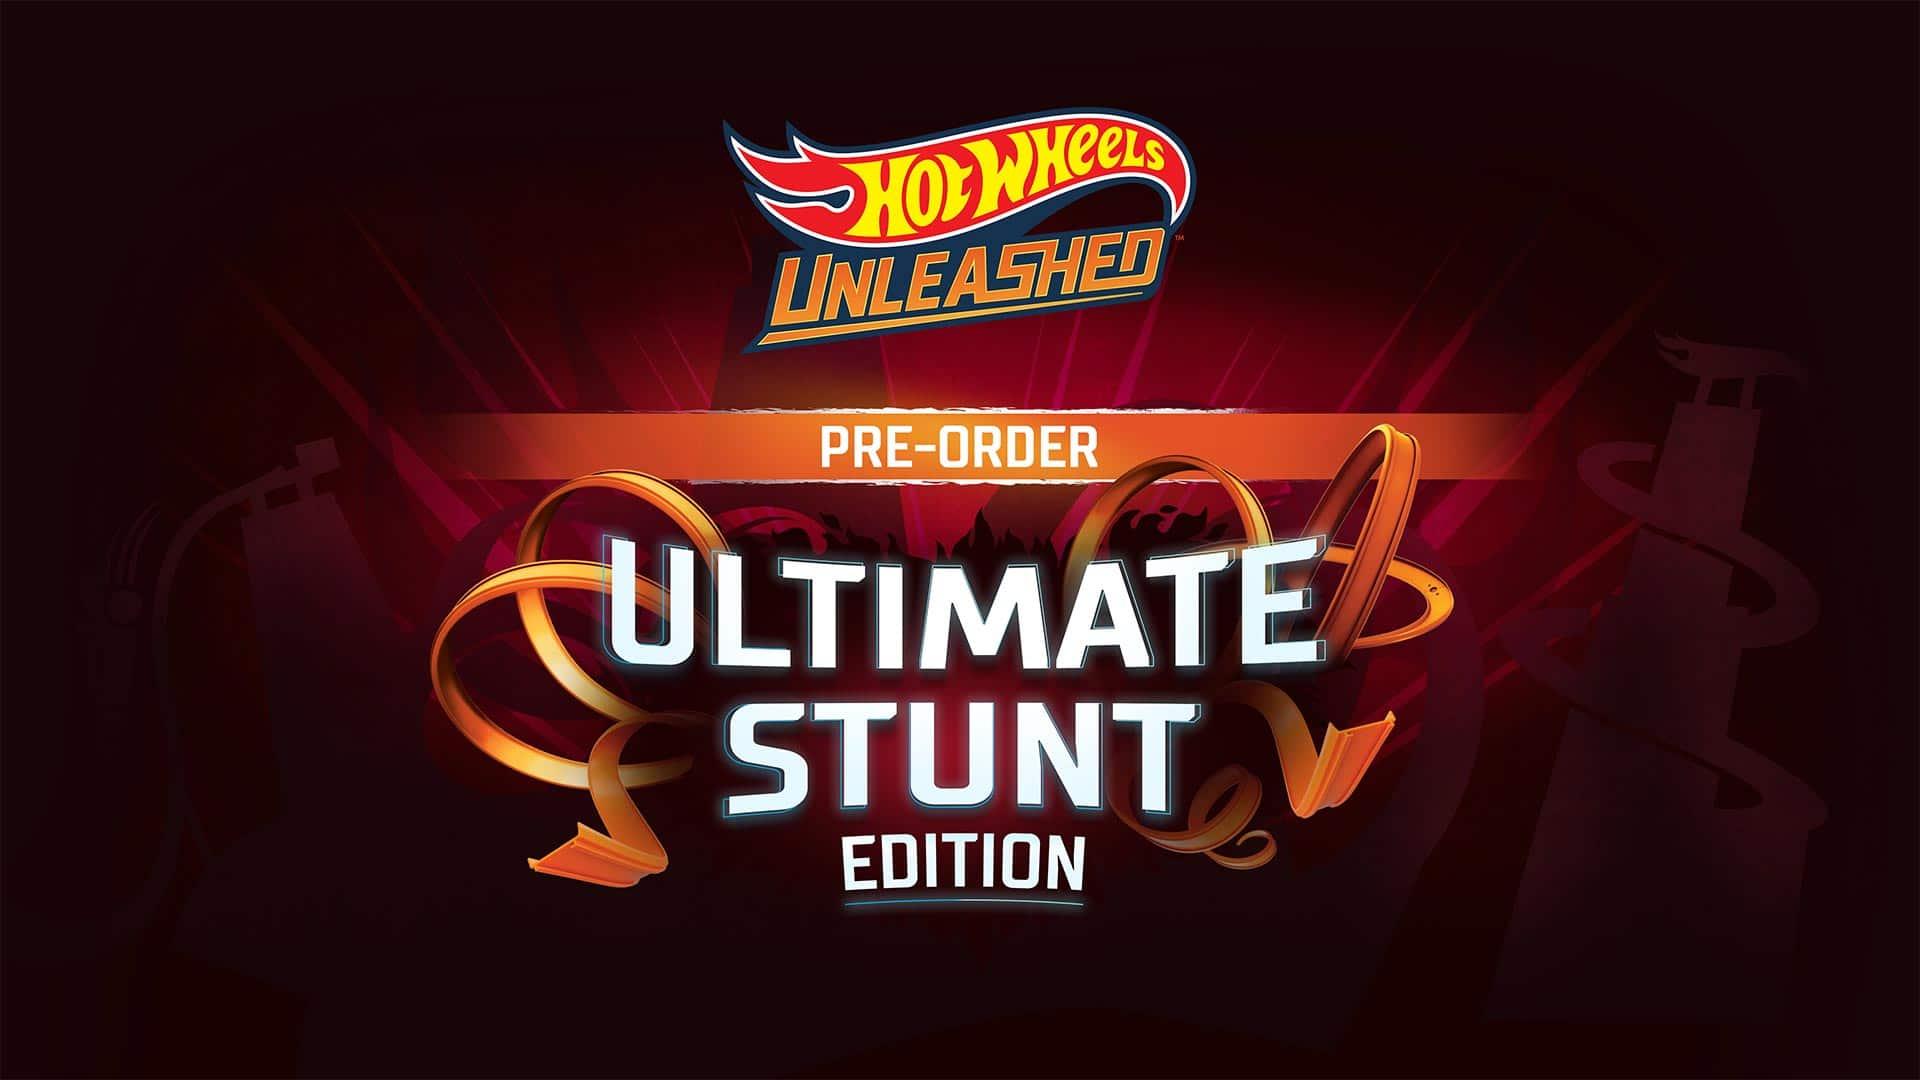 HOTWHEELS unleashed grafico milano ultimate stunt 01